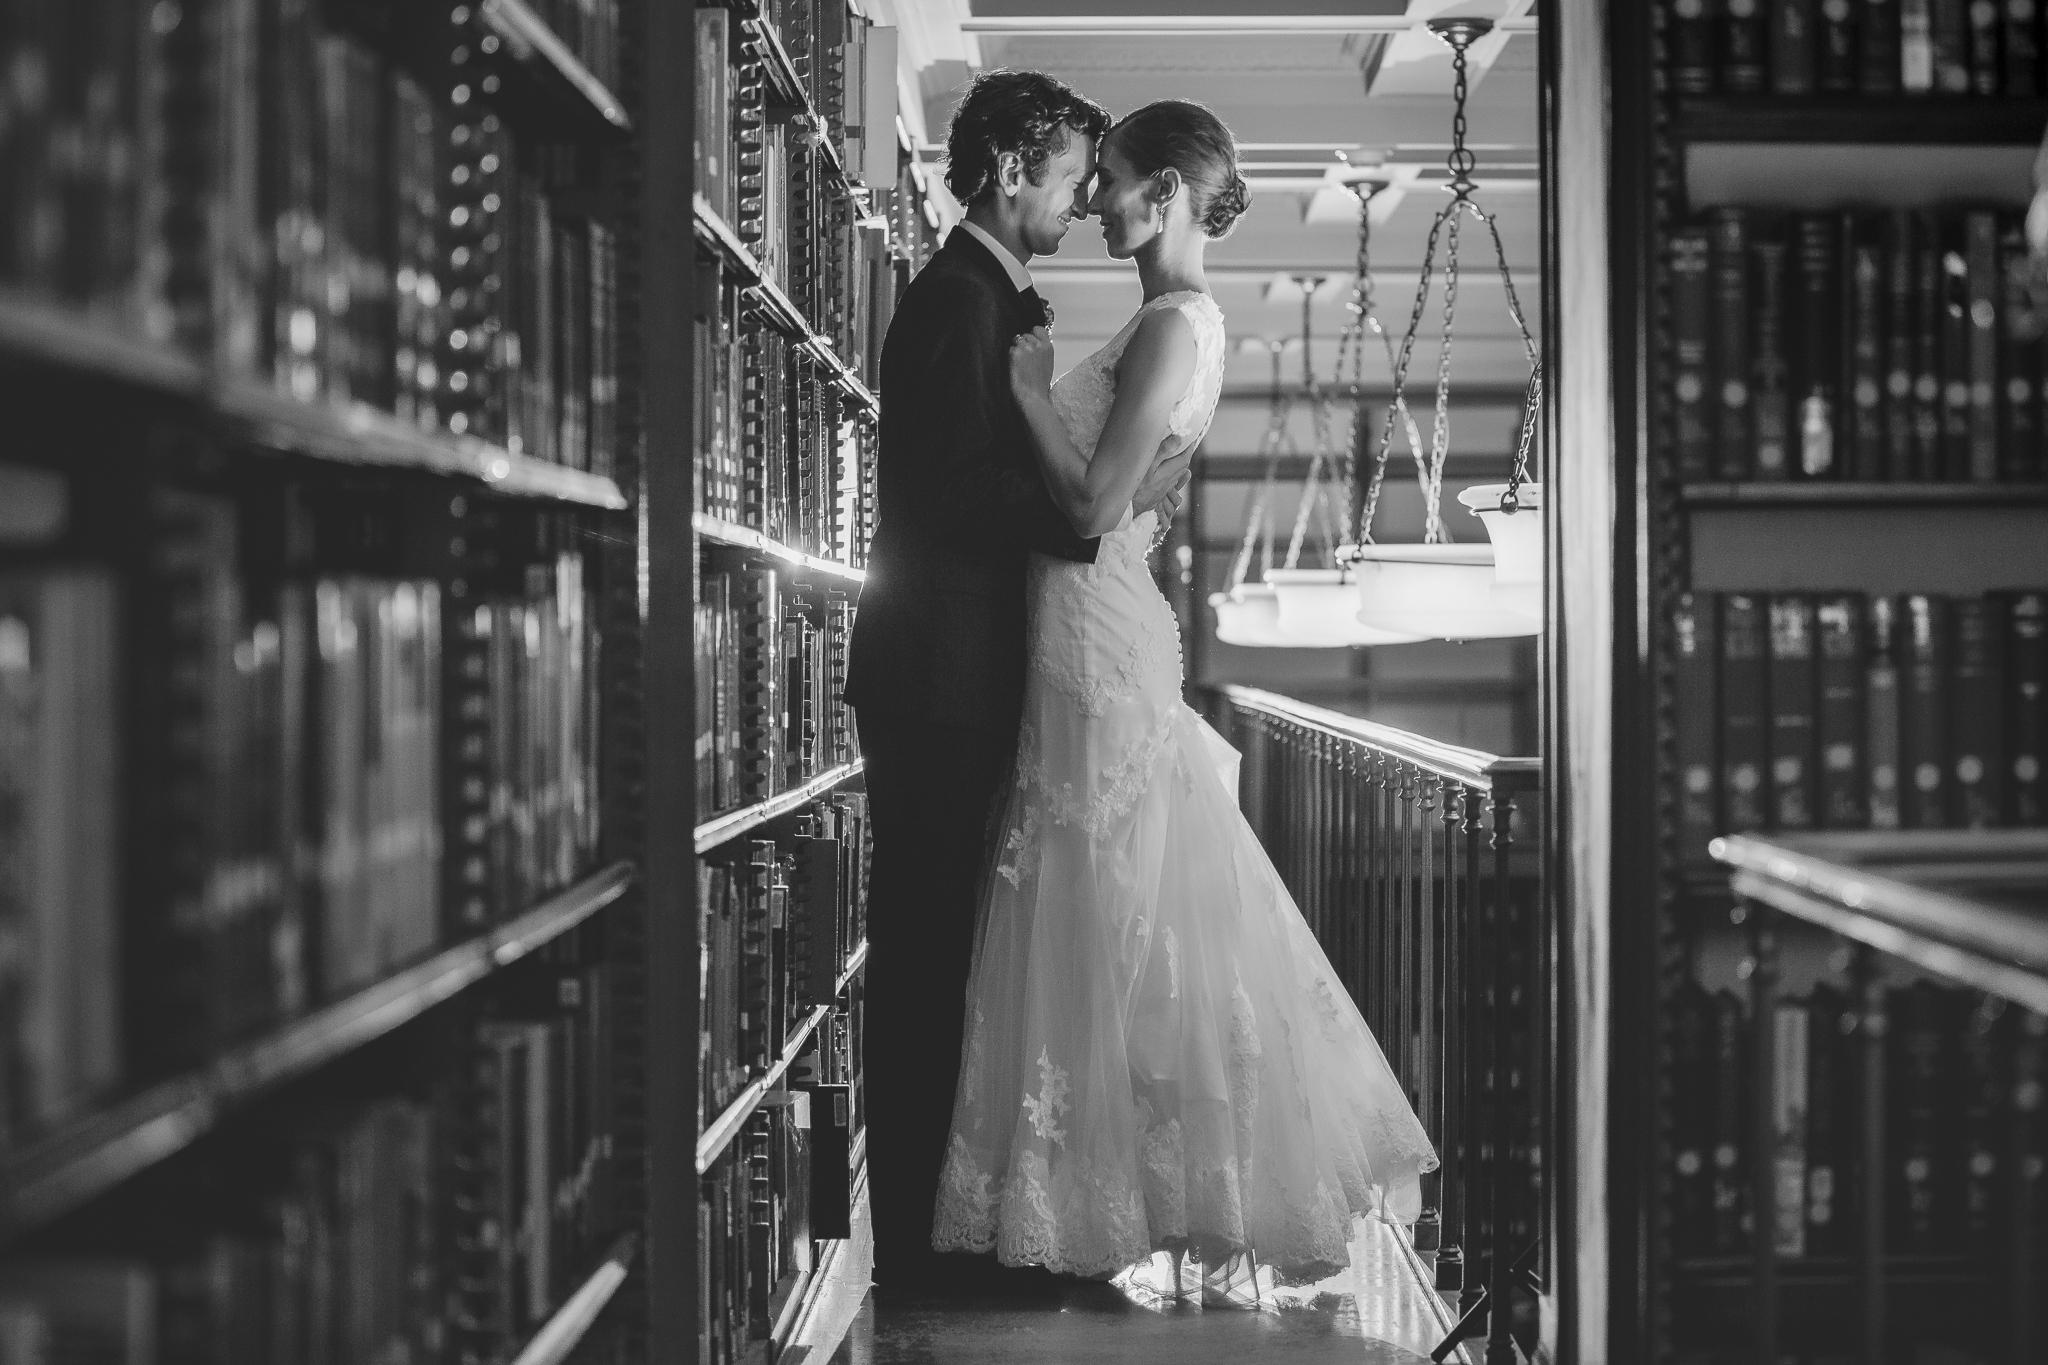 james j hill library wedding photography-25.jpg